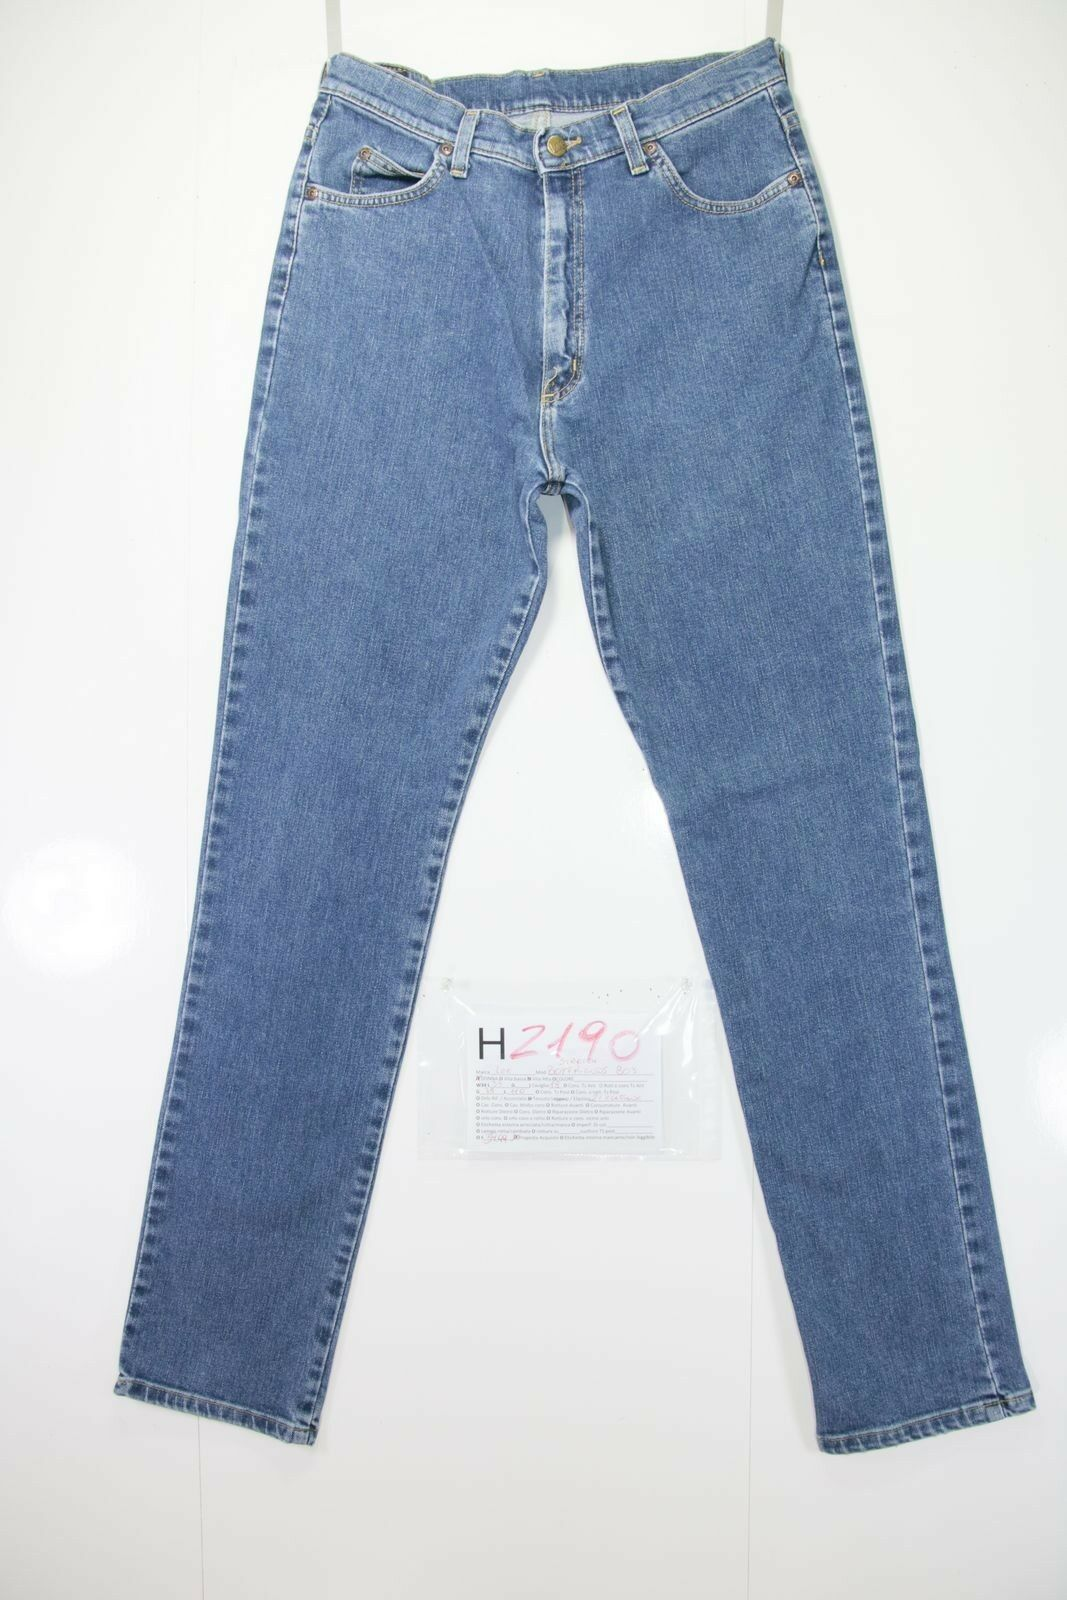 Lee stretch boyfriend's 80 (Cod. H2190) Tg.48 W34 L33 jeans usato vita alta